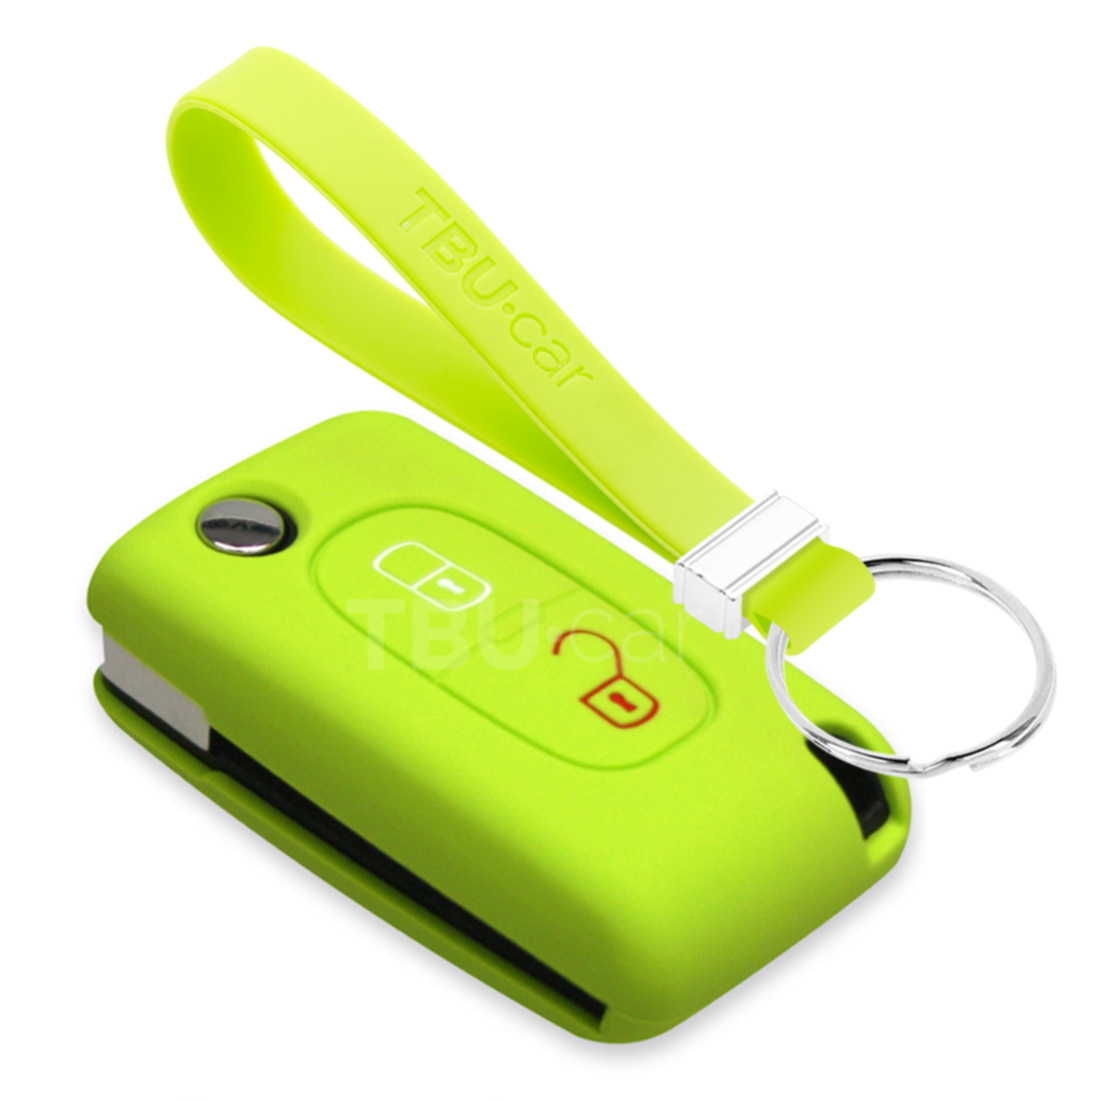 TBU car TBU car Autoschlüssel Hülle kompatibel mit Peugeot 2 Tasten - Schutzhülle aus Silikon - Auto Schlüsselhülle Cover in Lindgrün